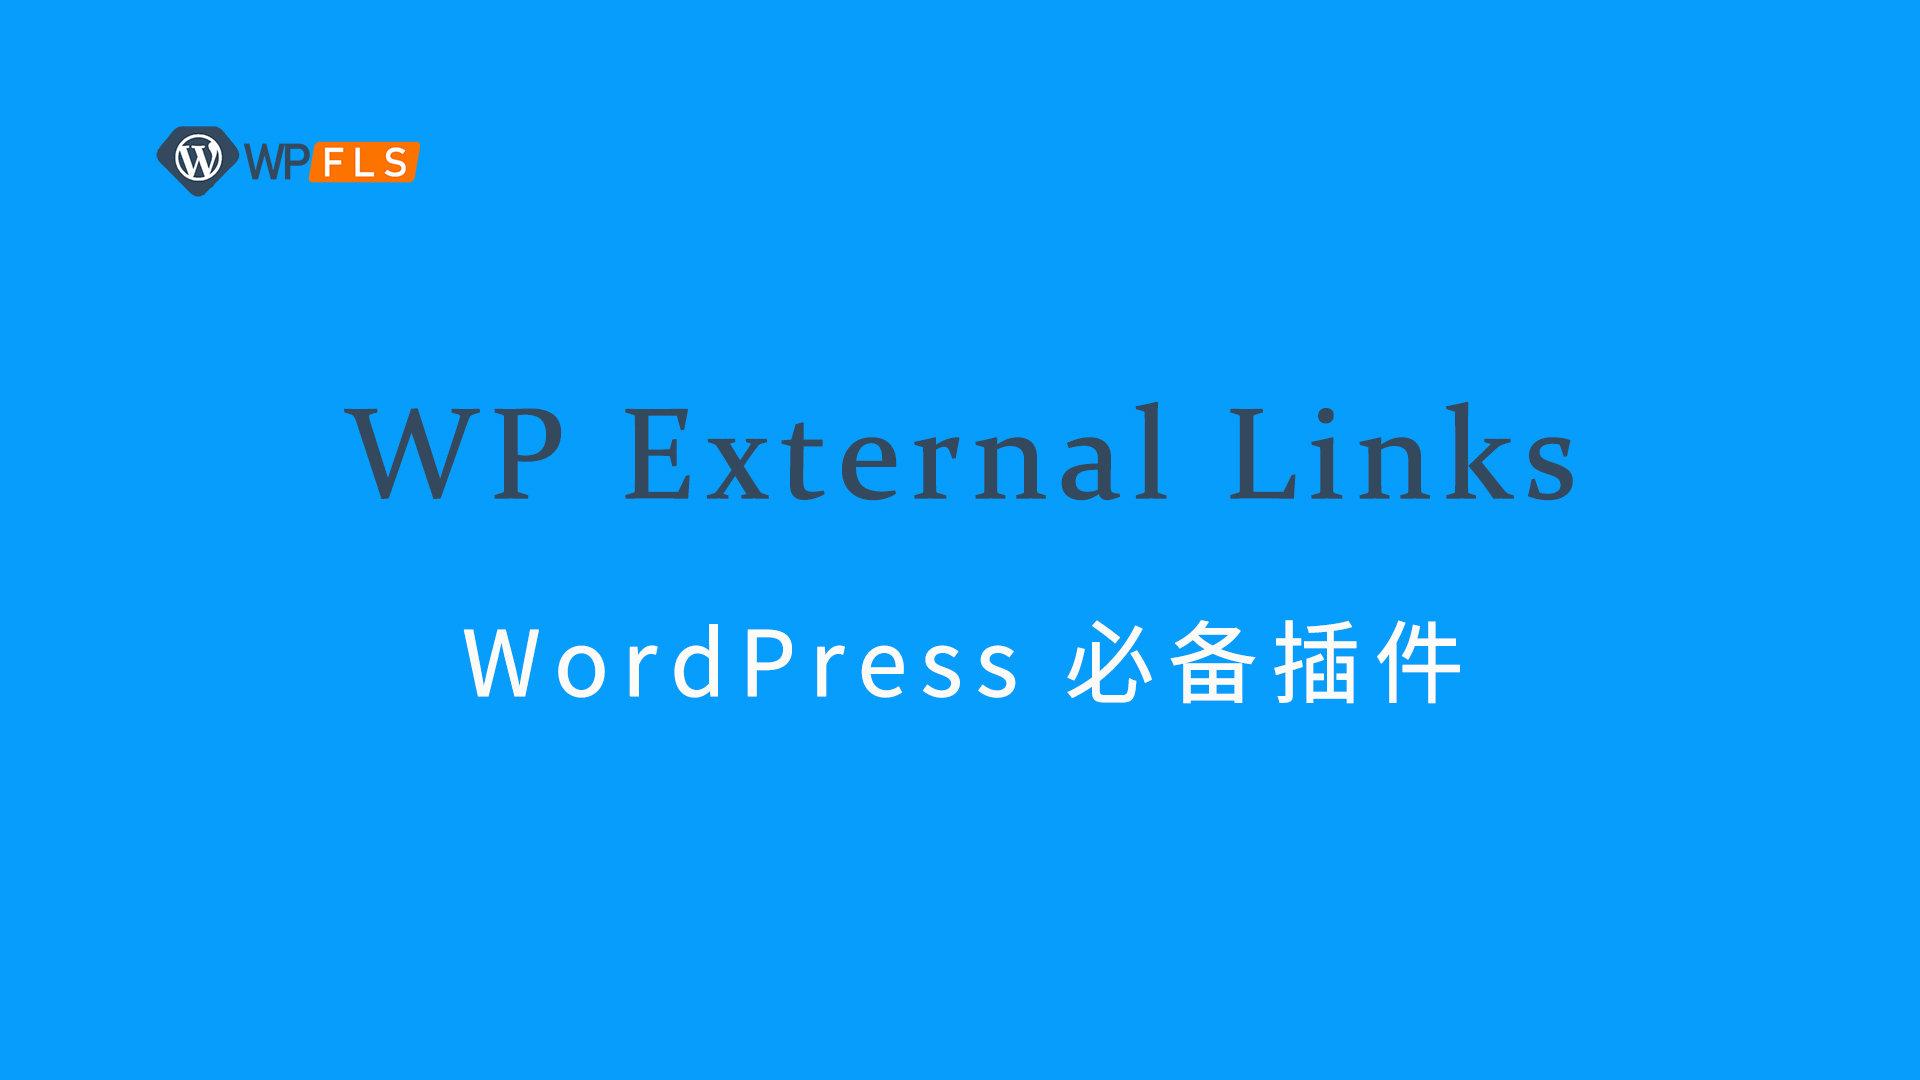 WordPress插件丨WP External Links 你的 WordPress 必备插件